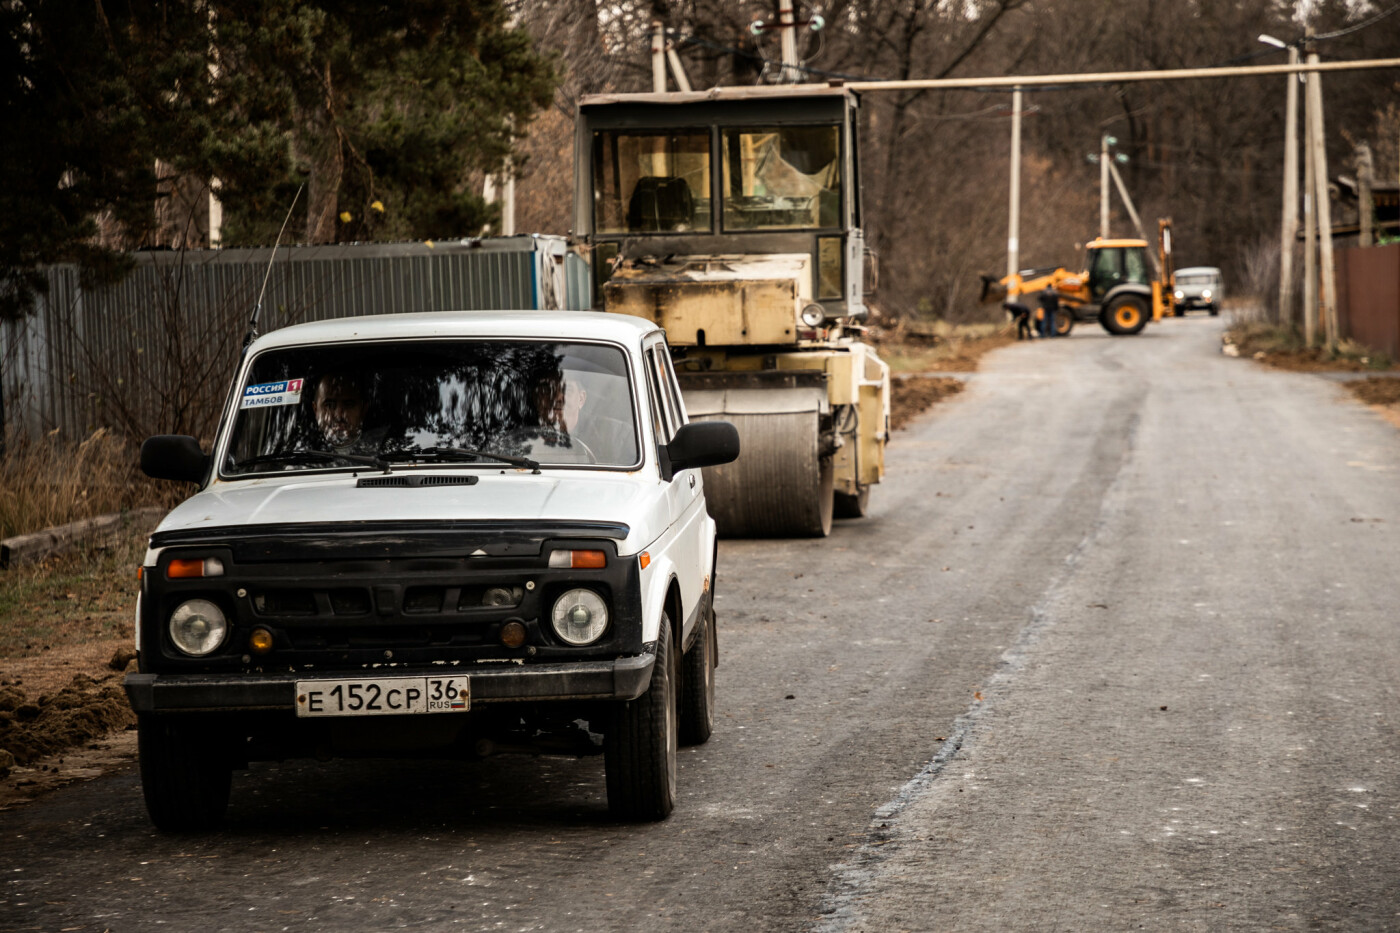 В пригороде Тамбова построили новую дорогу за 3,4 млн рублей, фото-4